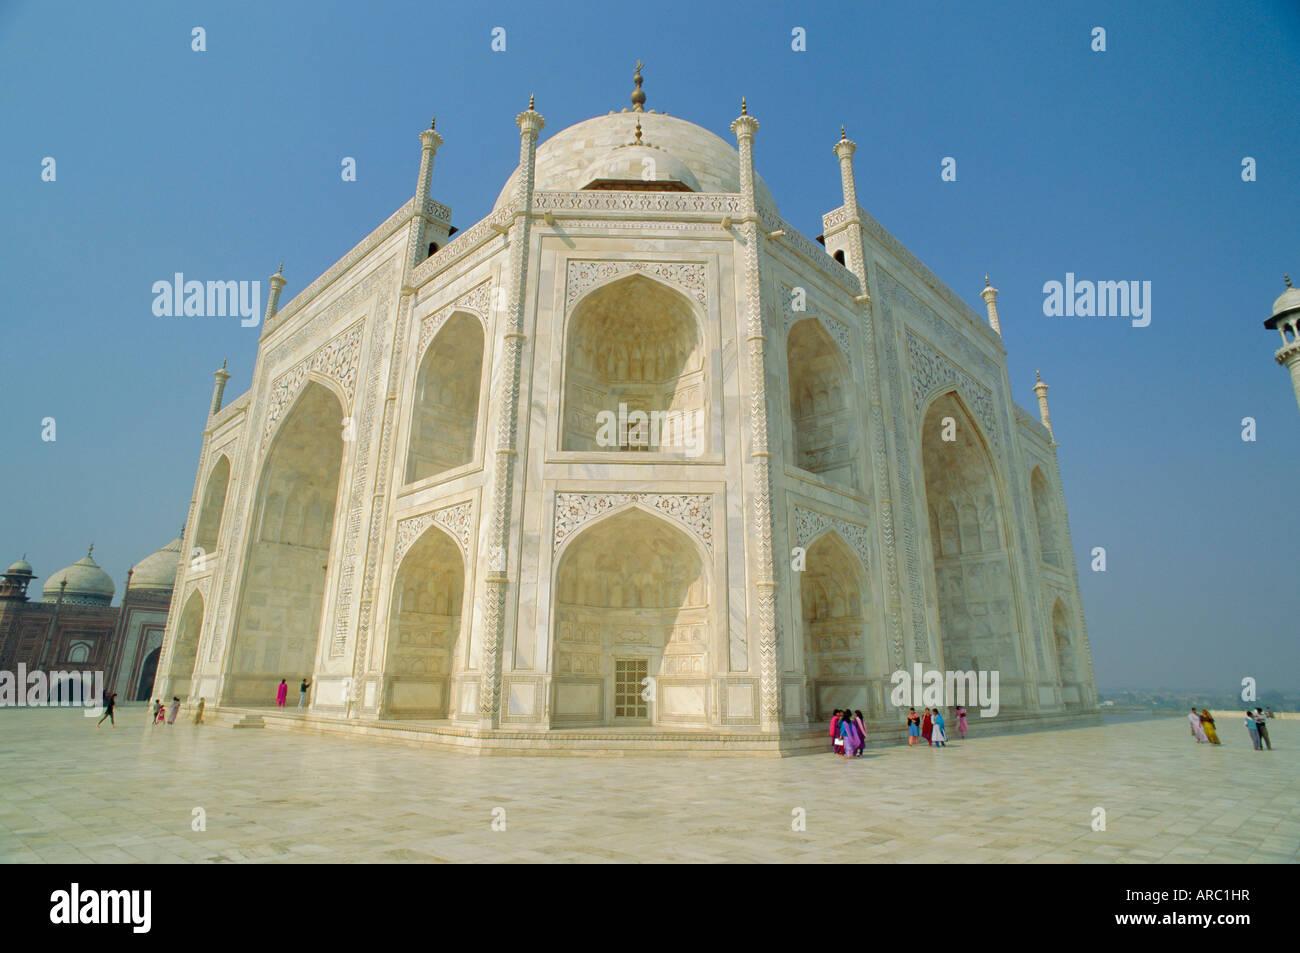 The Taj Mahal, built by the Moghul emperor Shah Jehan (Jahan), Agra, Uttar Pradesh, India - Stock Image